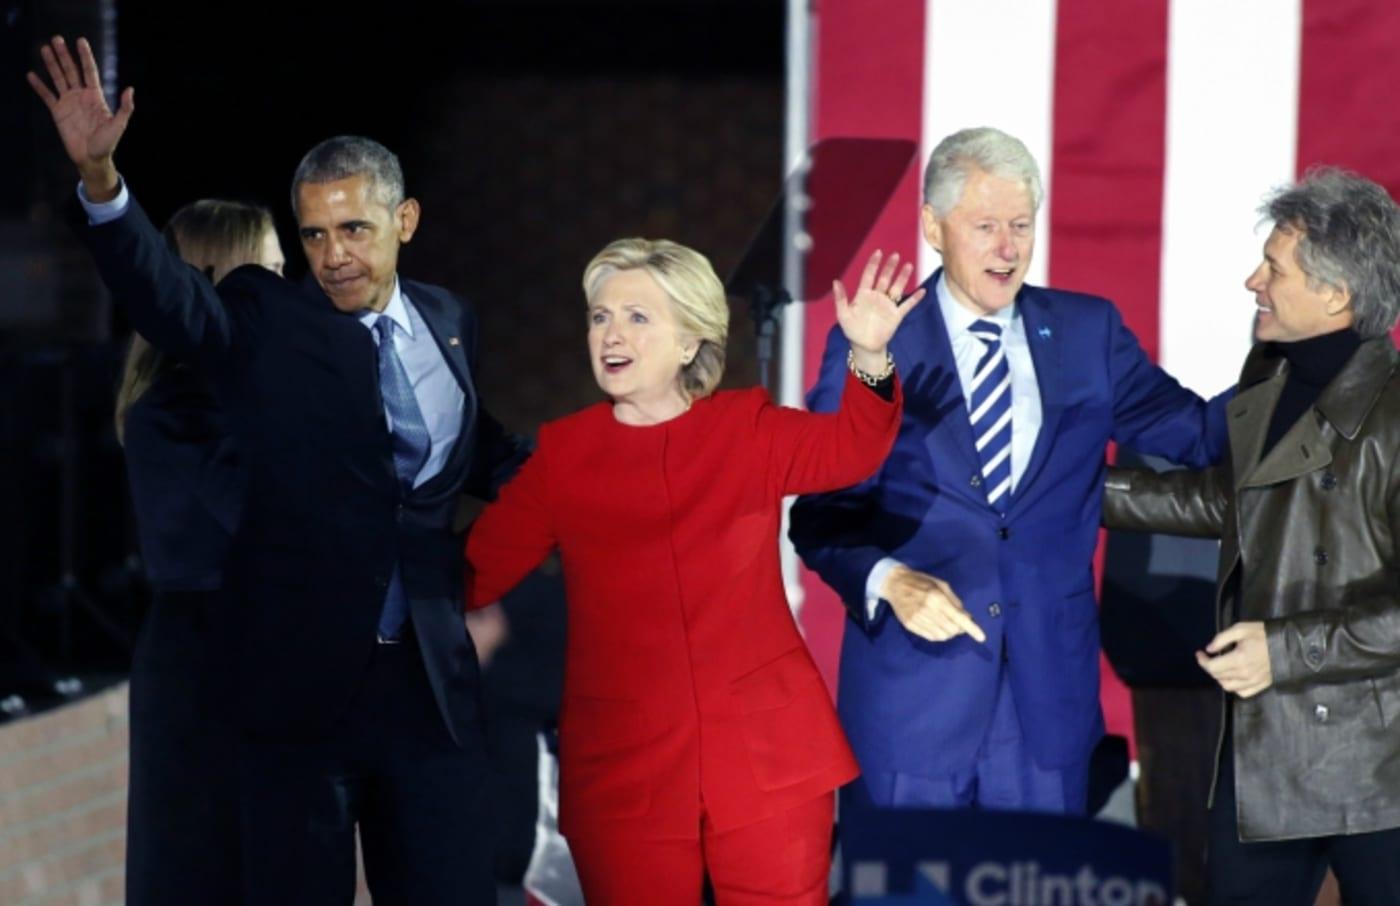 Barack Obama and Hillary Clinton at a rally.